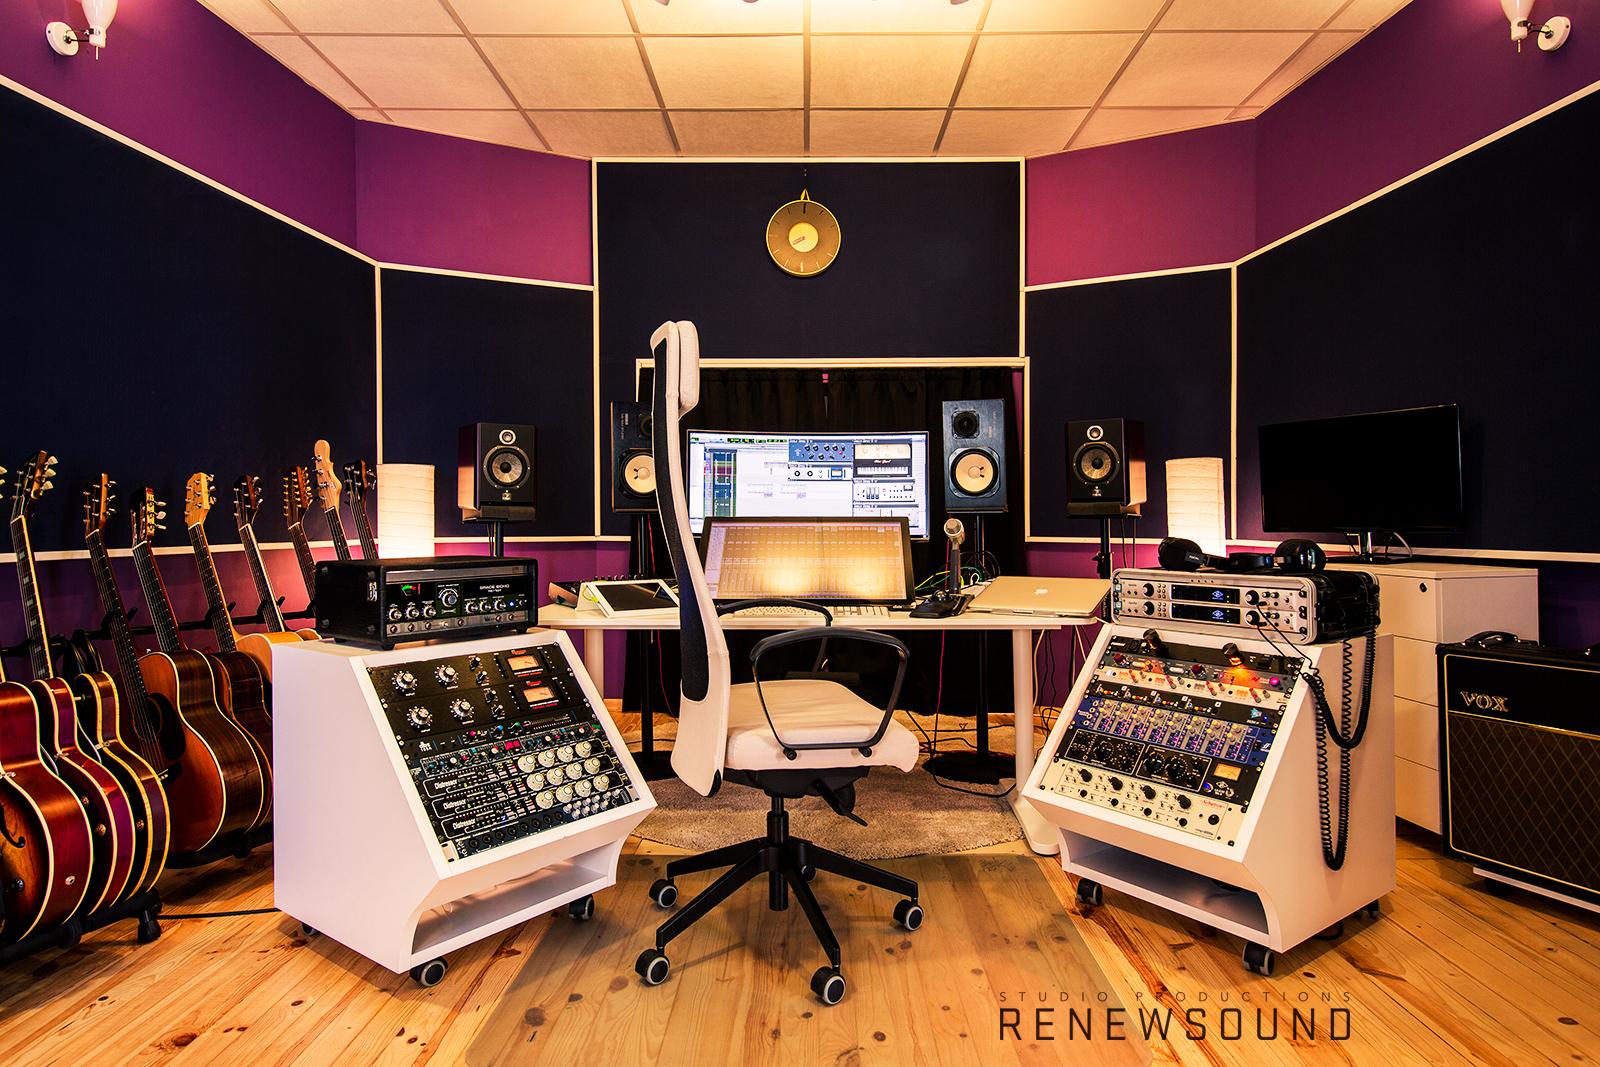 RENEWSOUND Studio productions - Аудио звукозаписно студио в София - Control Room